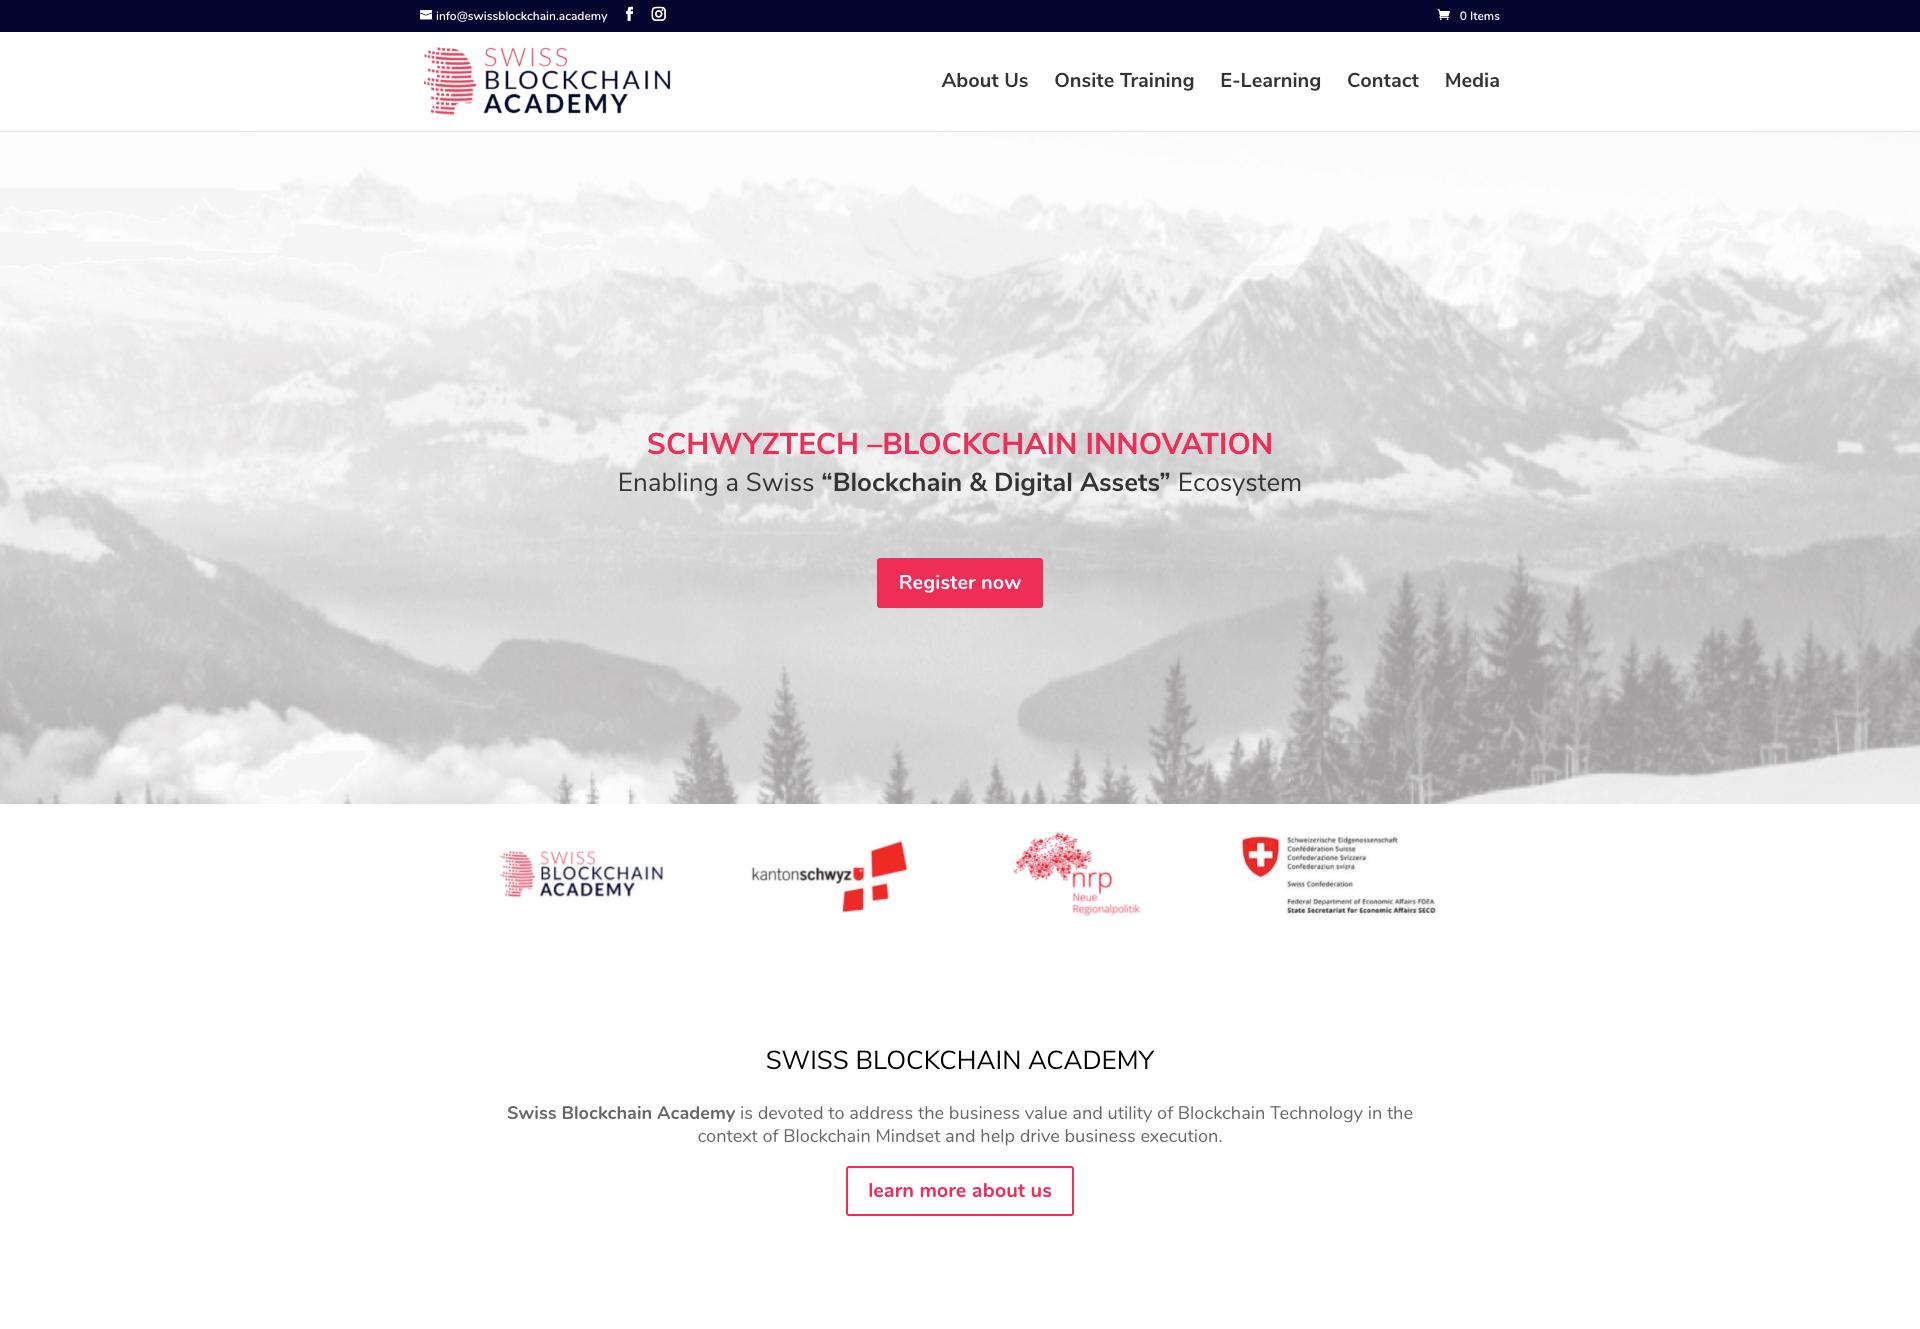 Swiss Blockchain Academy